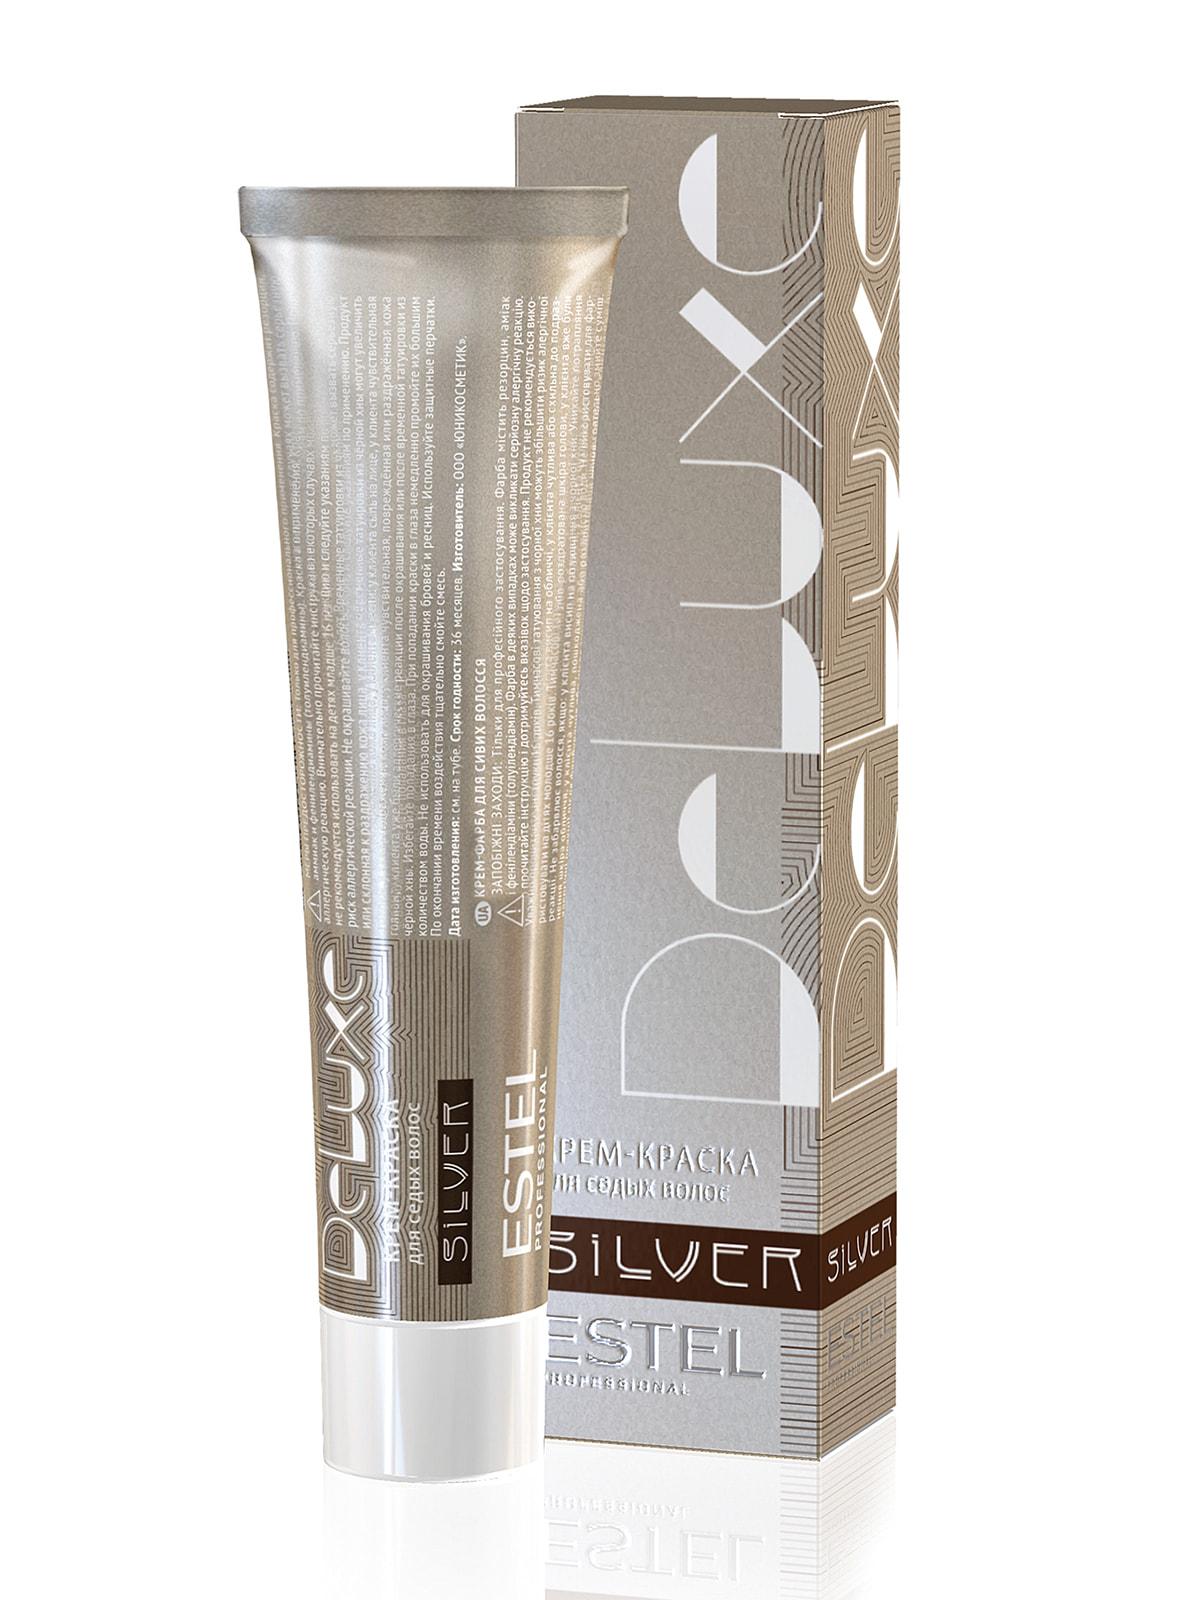 Крем-краска De Luxe Silver - светлый шатен красно-фиолетовый (60 мл)   4693769   фото 2